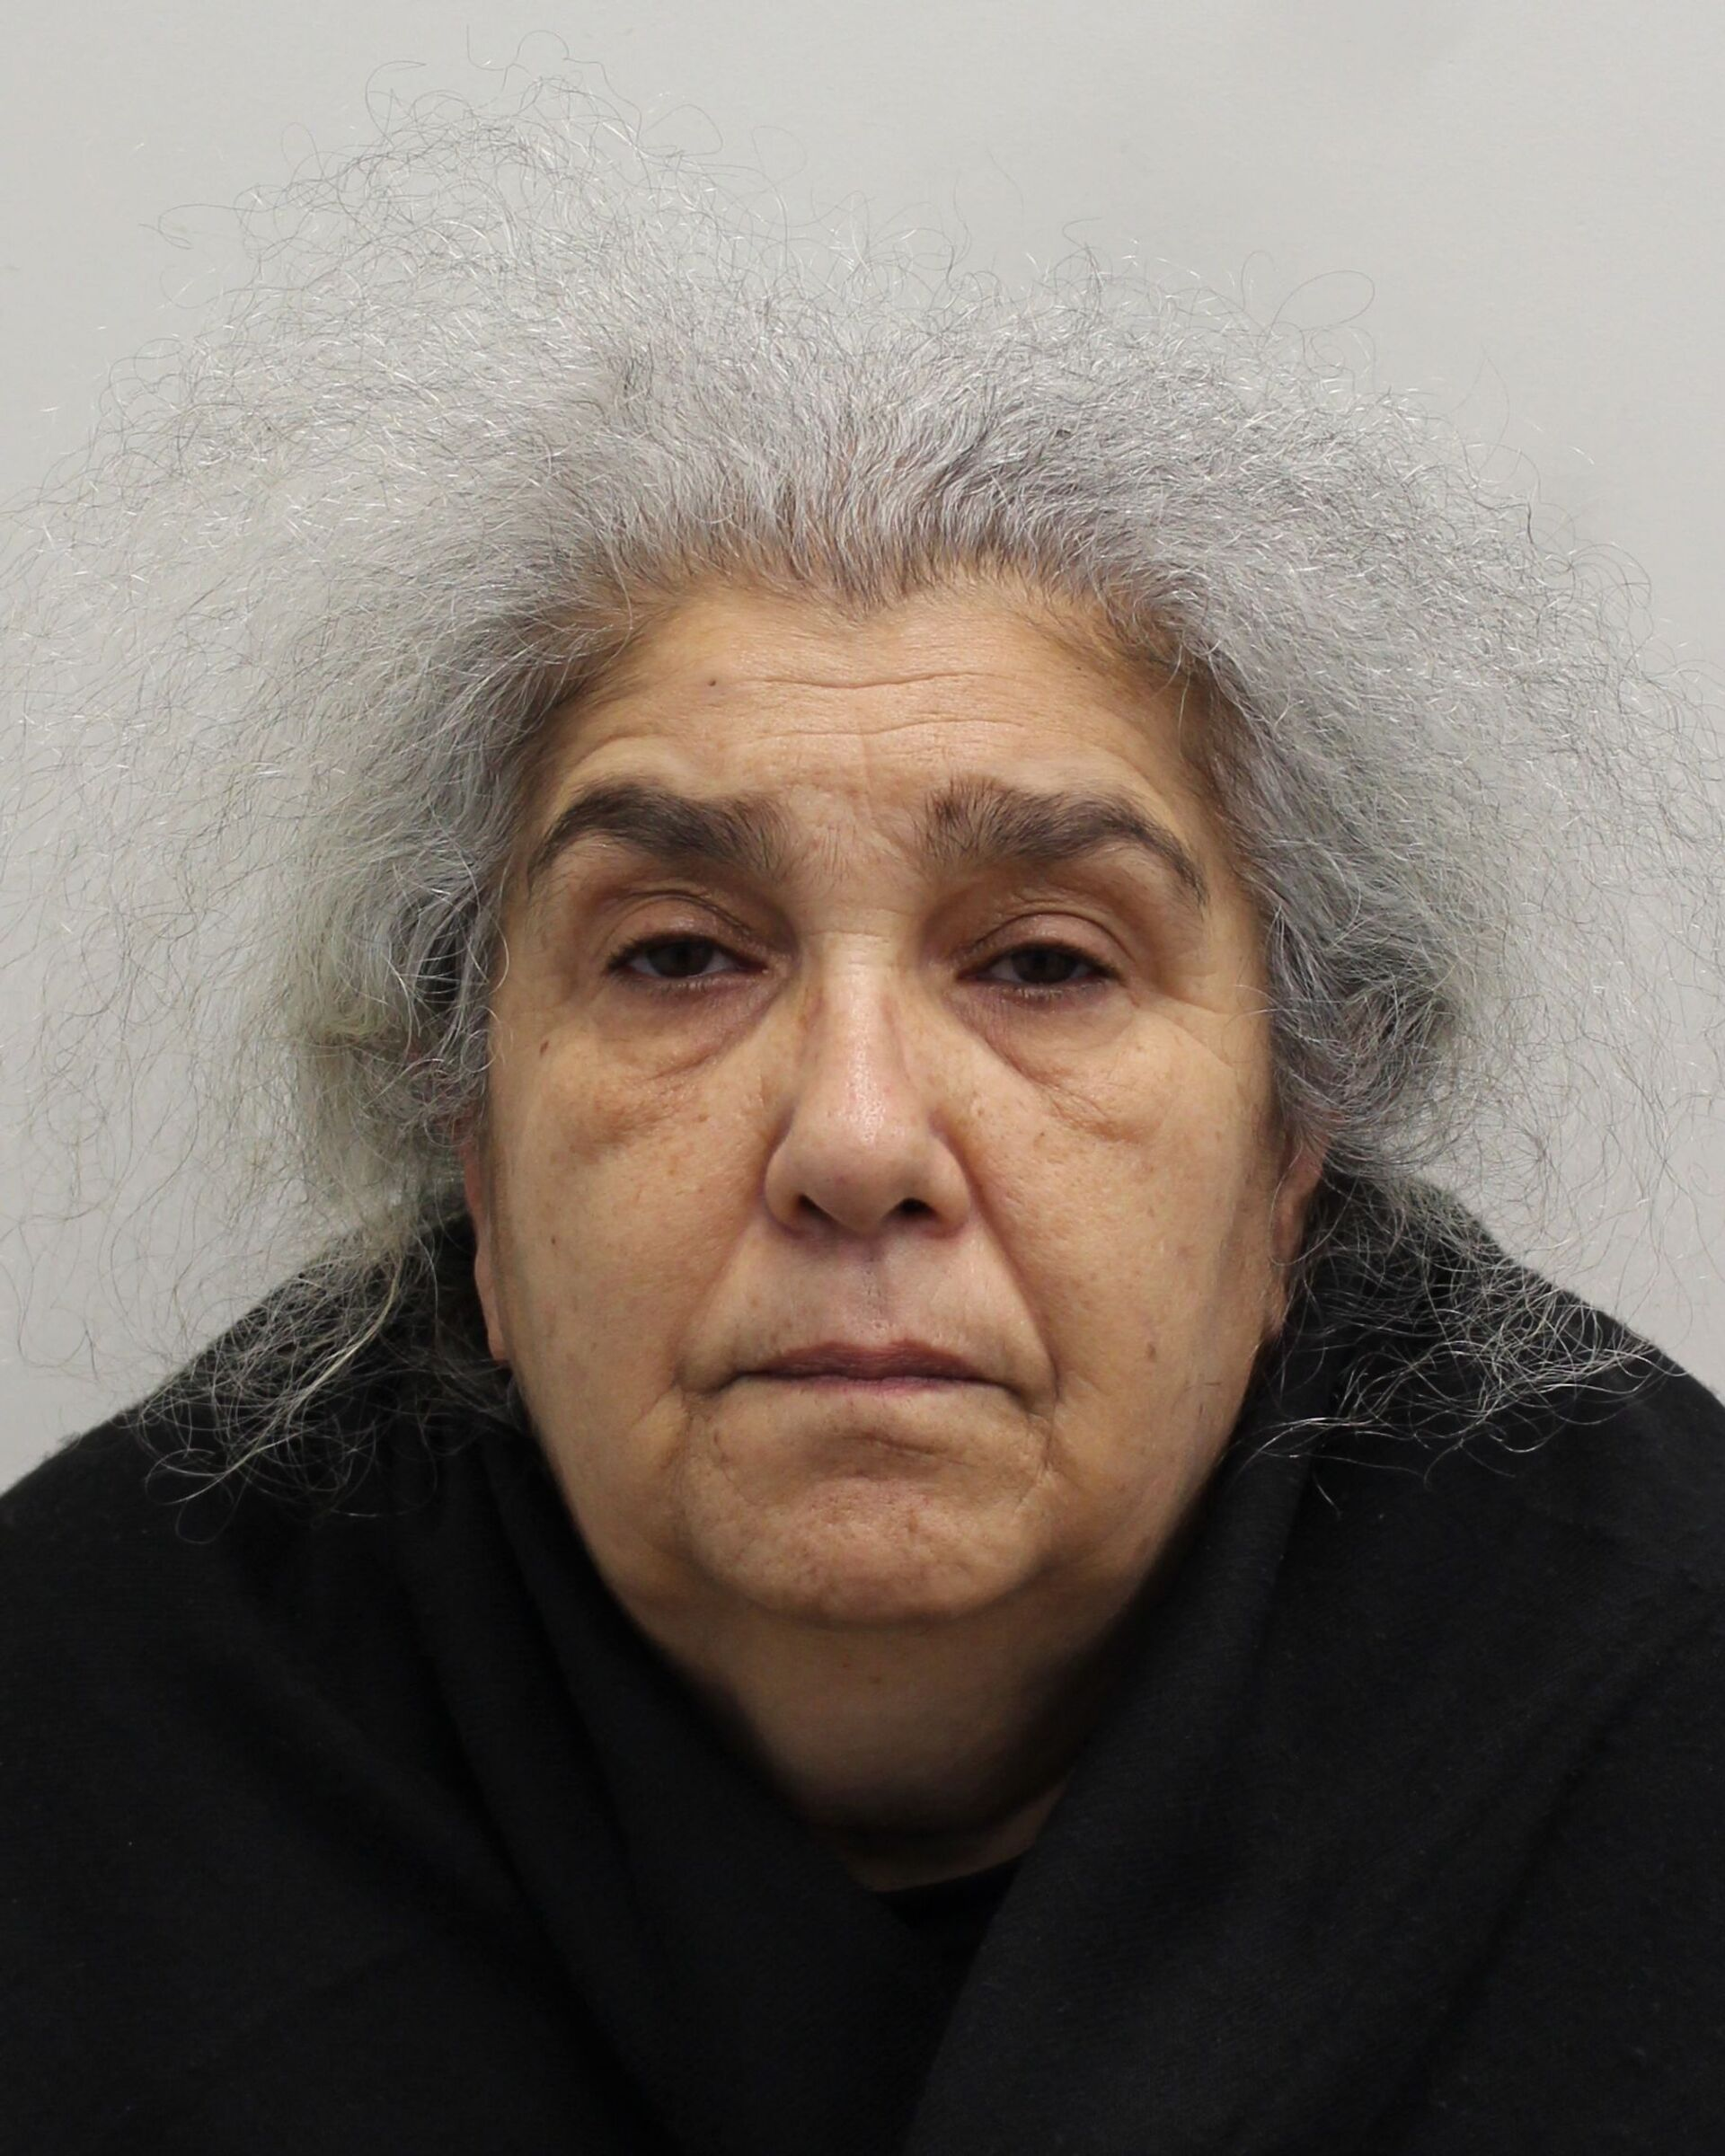 Lulu Lakatos, who posed as a gemologist to steal diamonds - Sputnik International, 1920, 07.09.2021